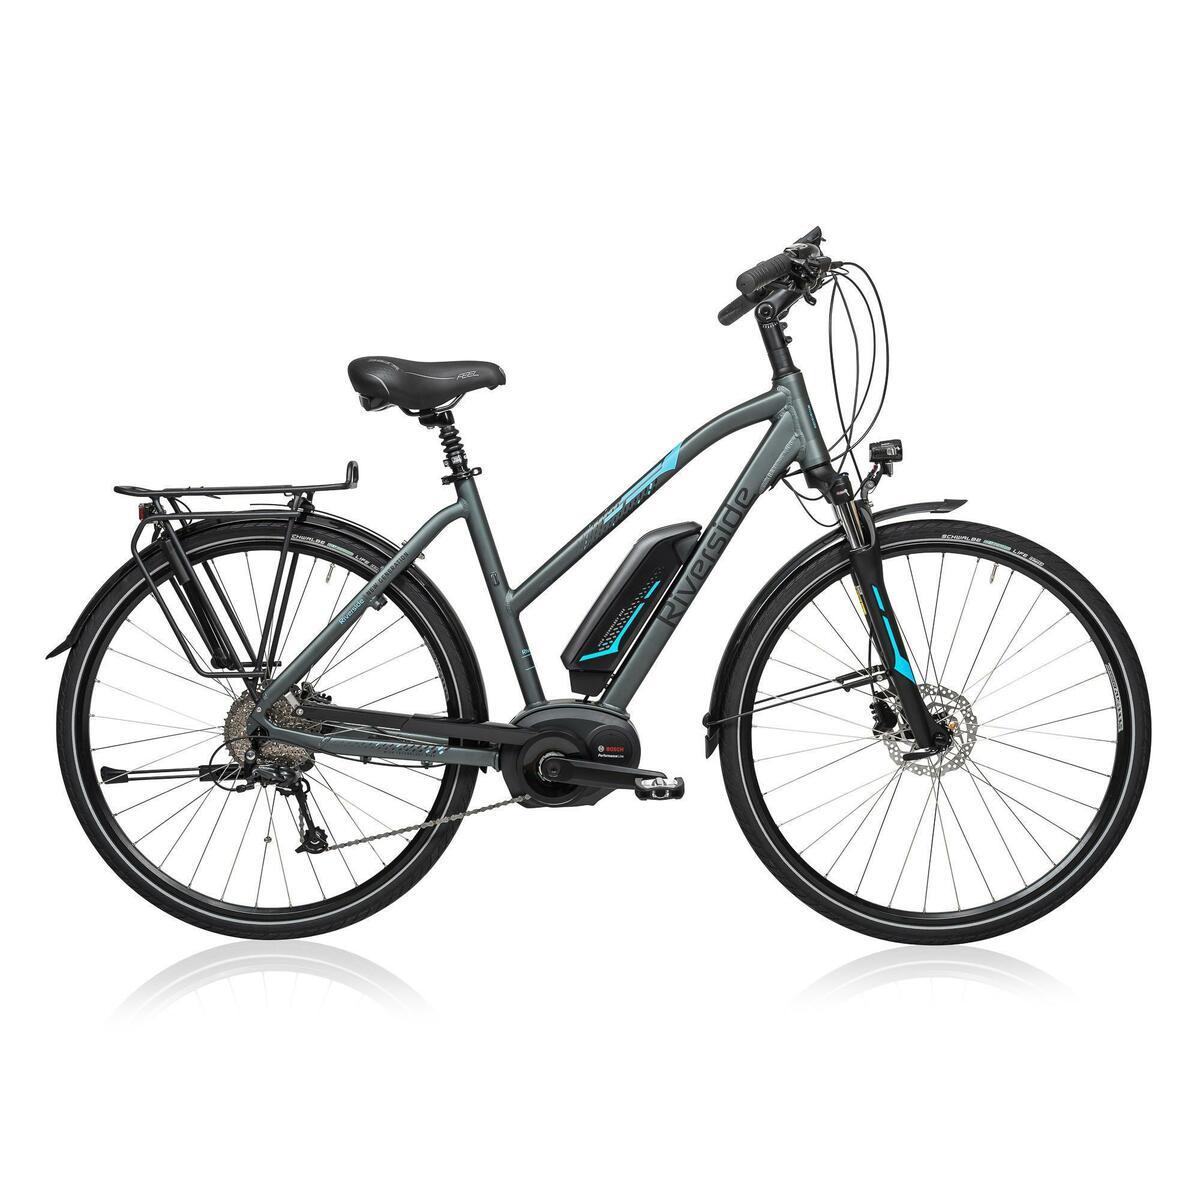 Bild 2 von E-Bike 28 Trekkingrad Riverside 500 Damen Performance Line 400Wh grau/blau